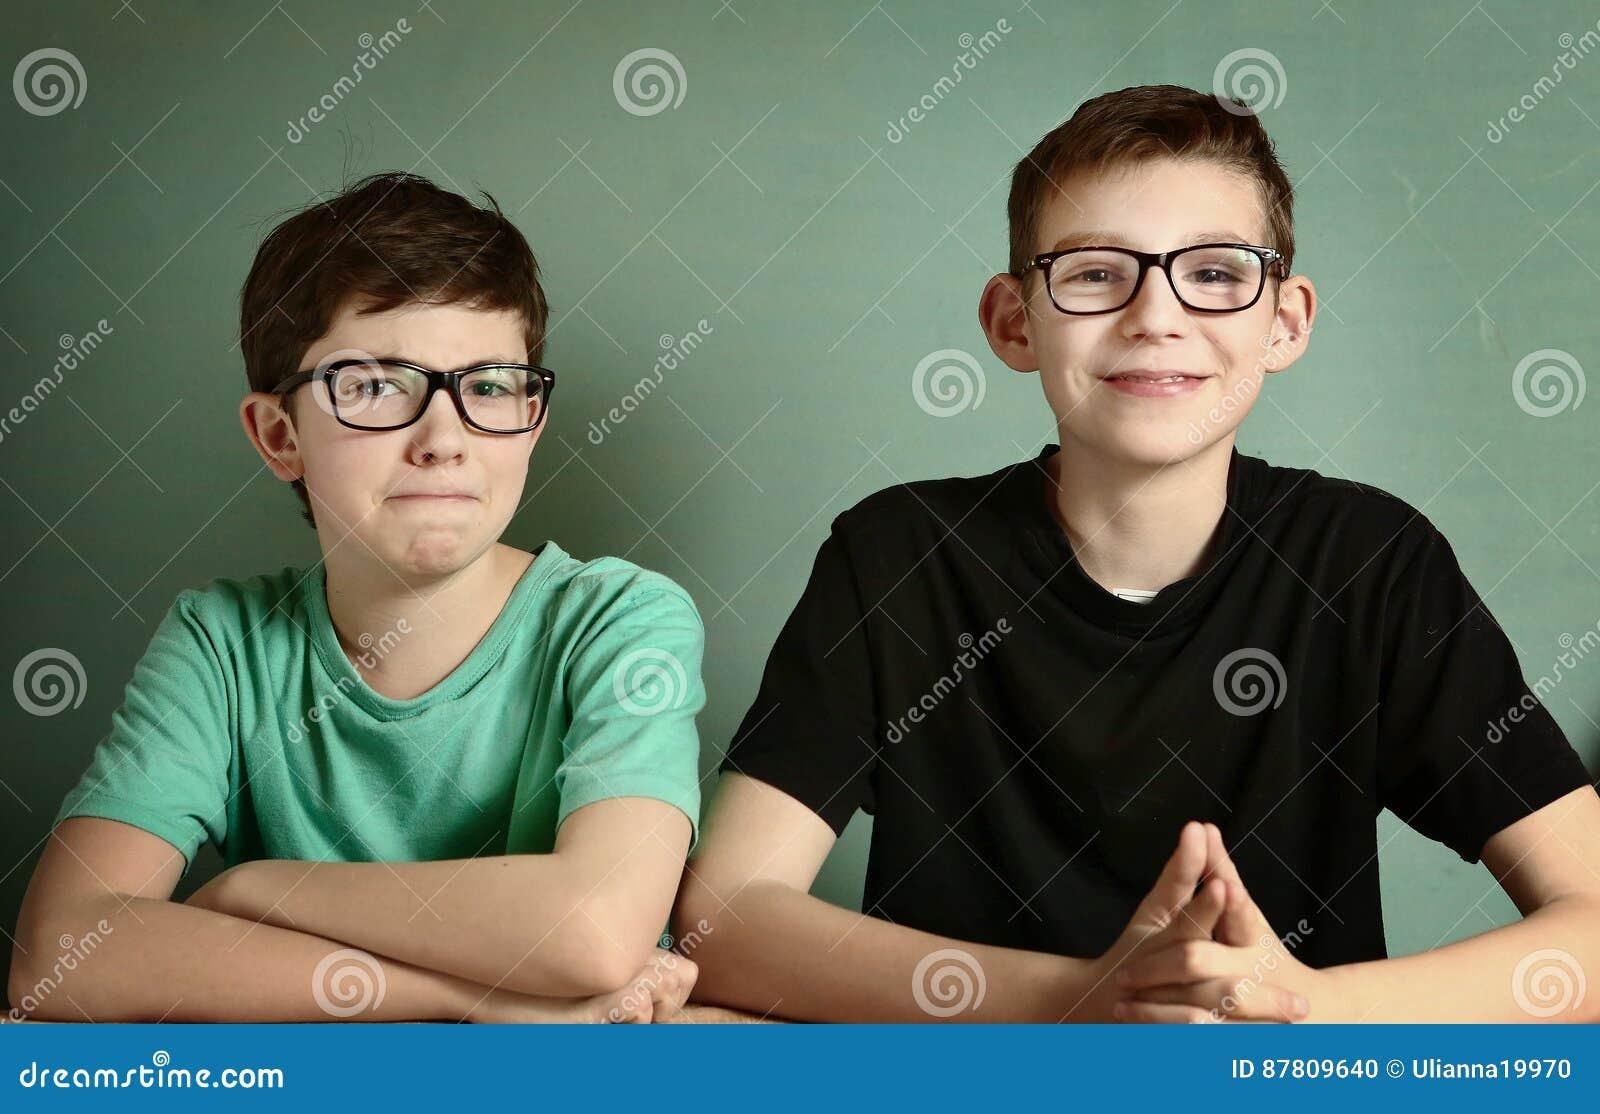 Short sighted teen boys in myopia glasses